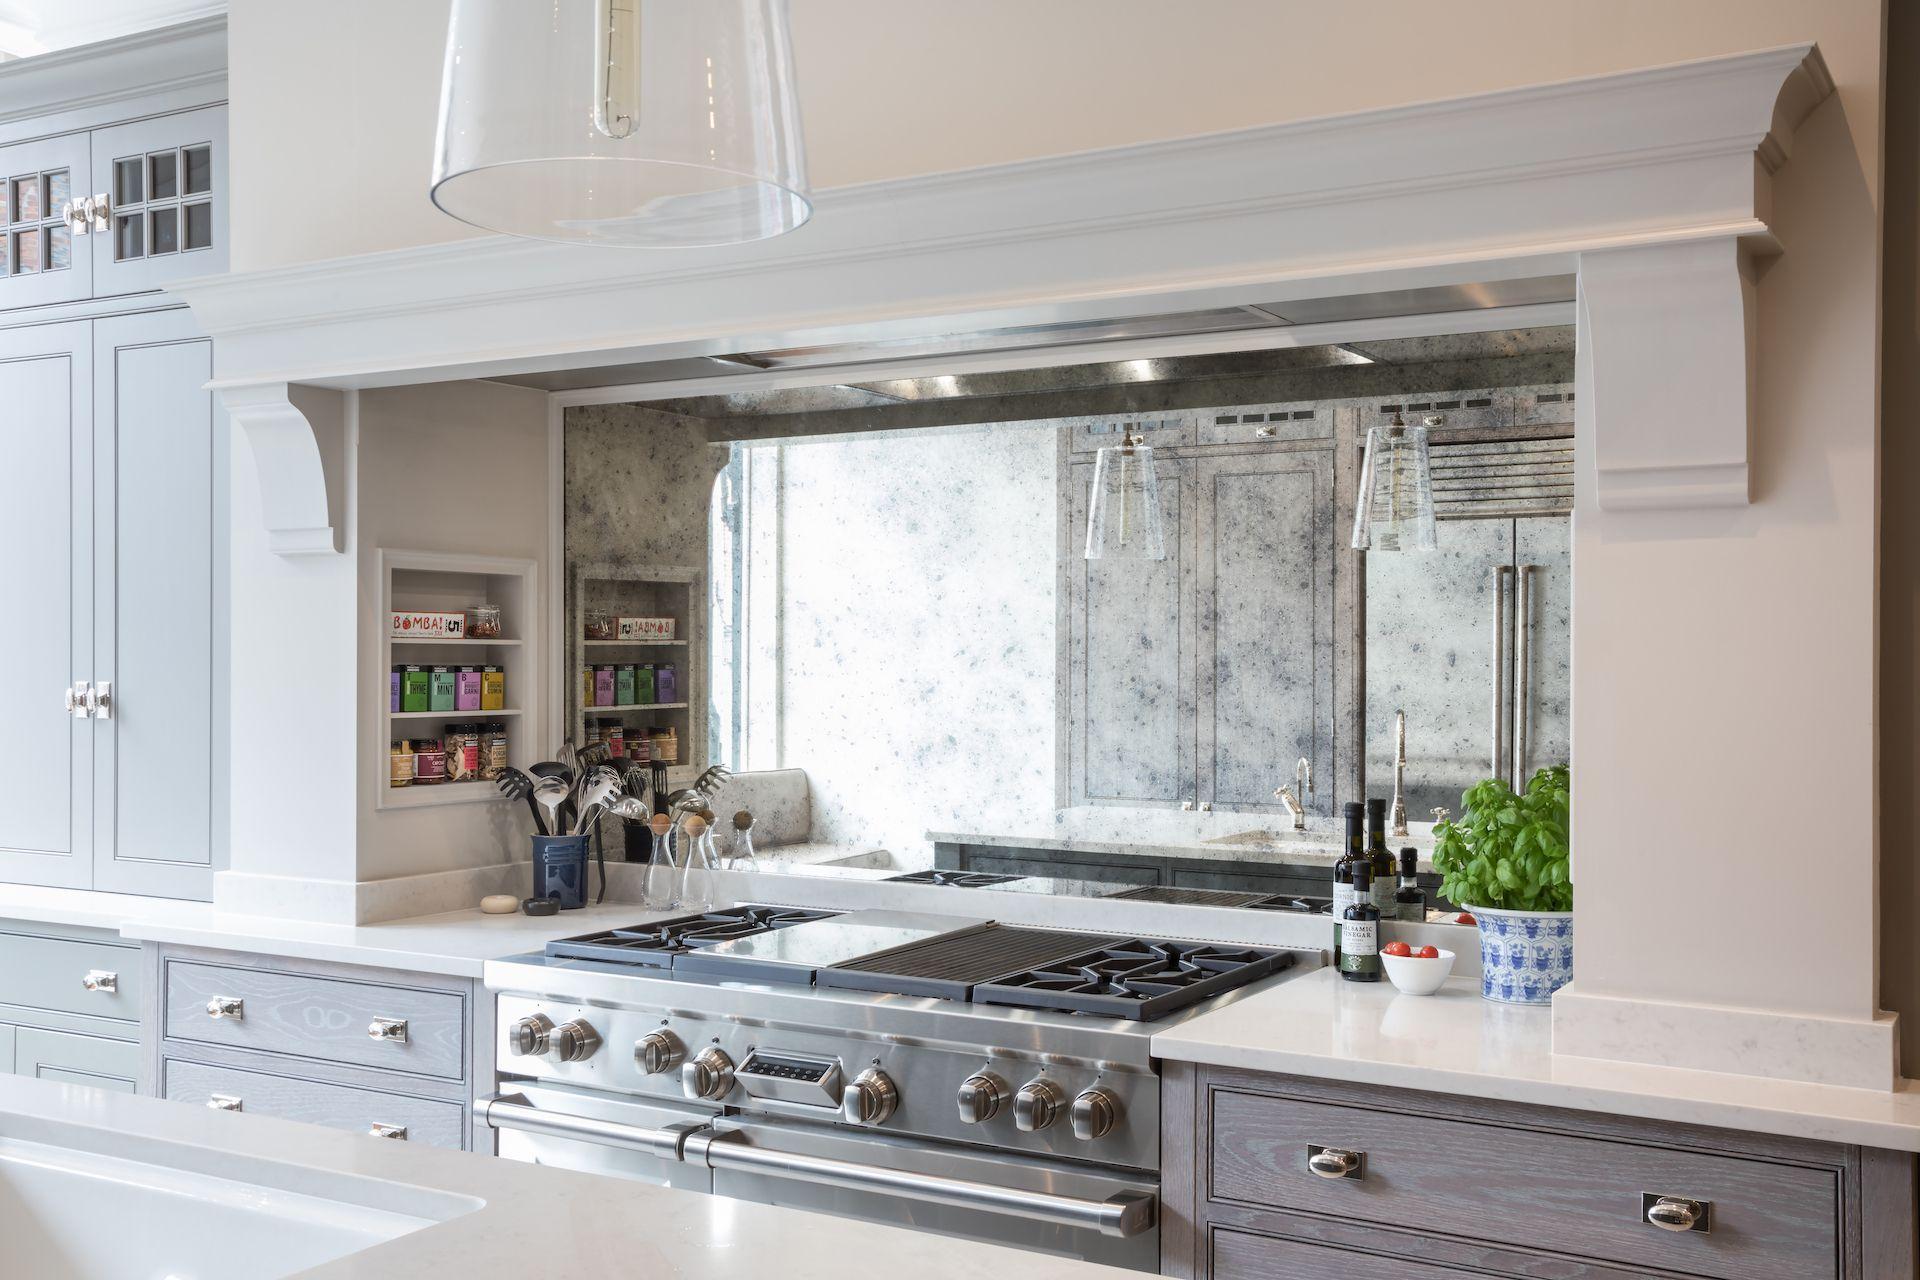 Spenlow Kitchen, St. Albans Showroom - Humphrey Munson Kitchens ...